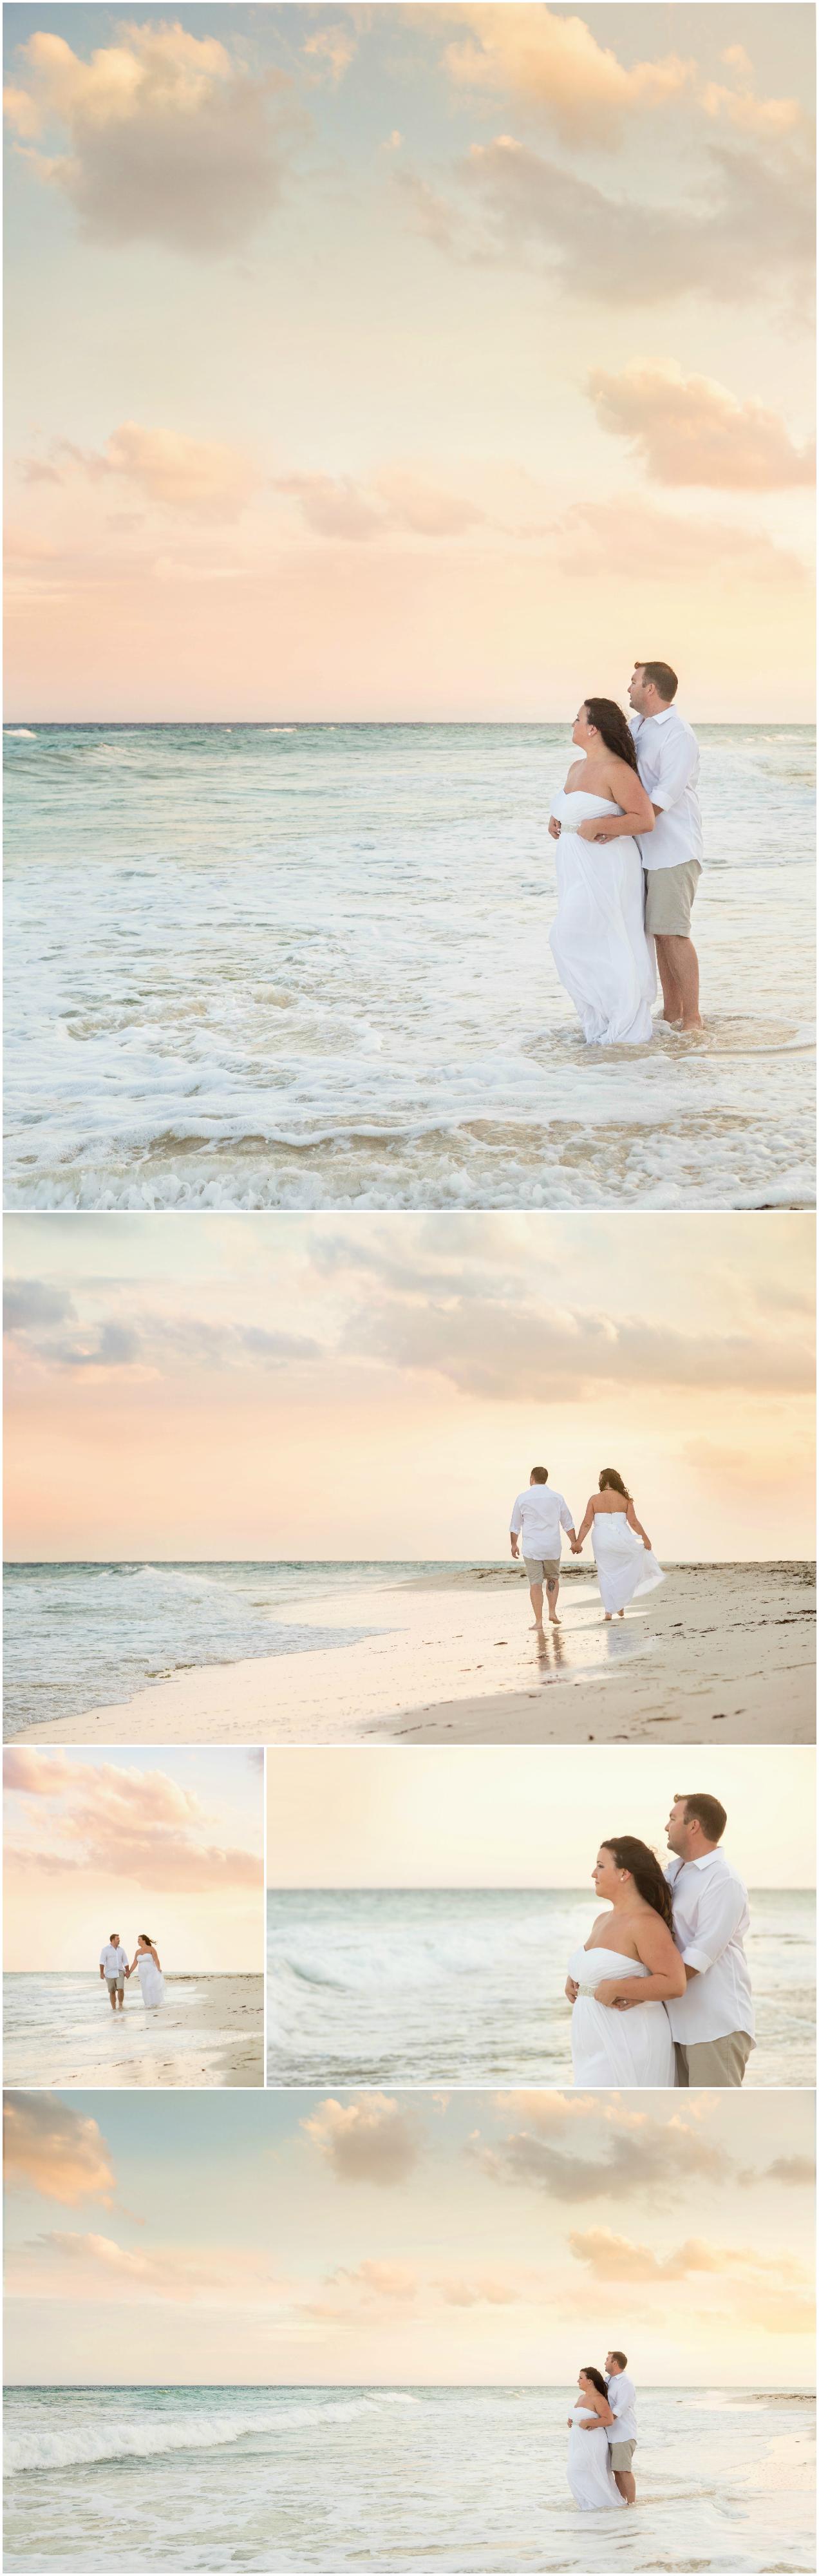 riviera-maya-wedding-ttd_5.png